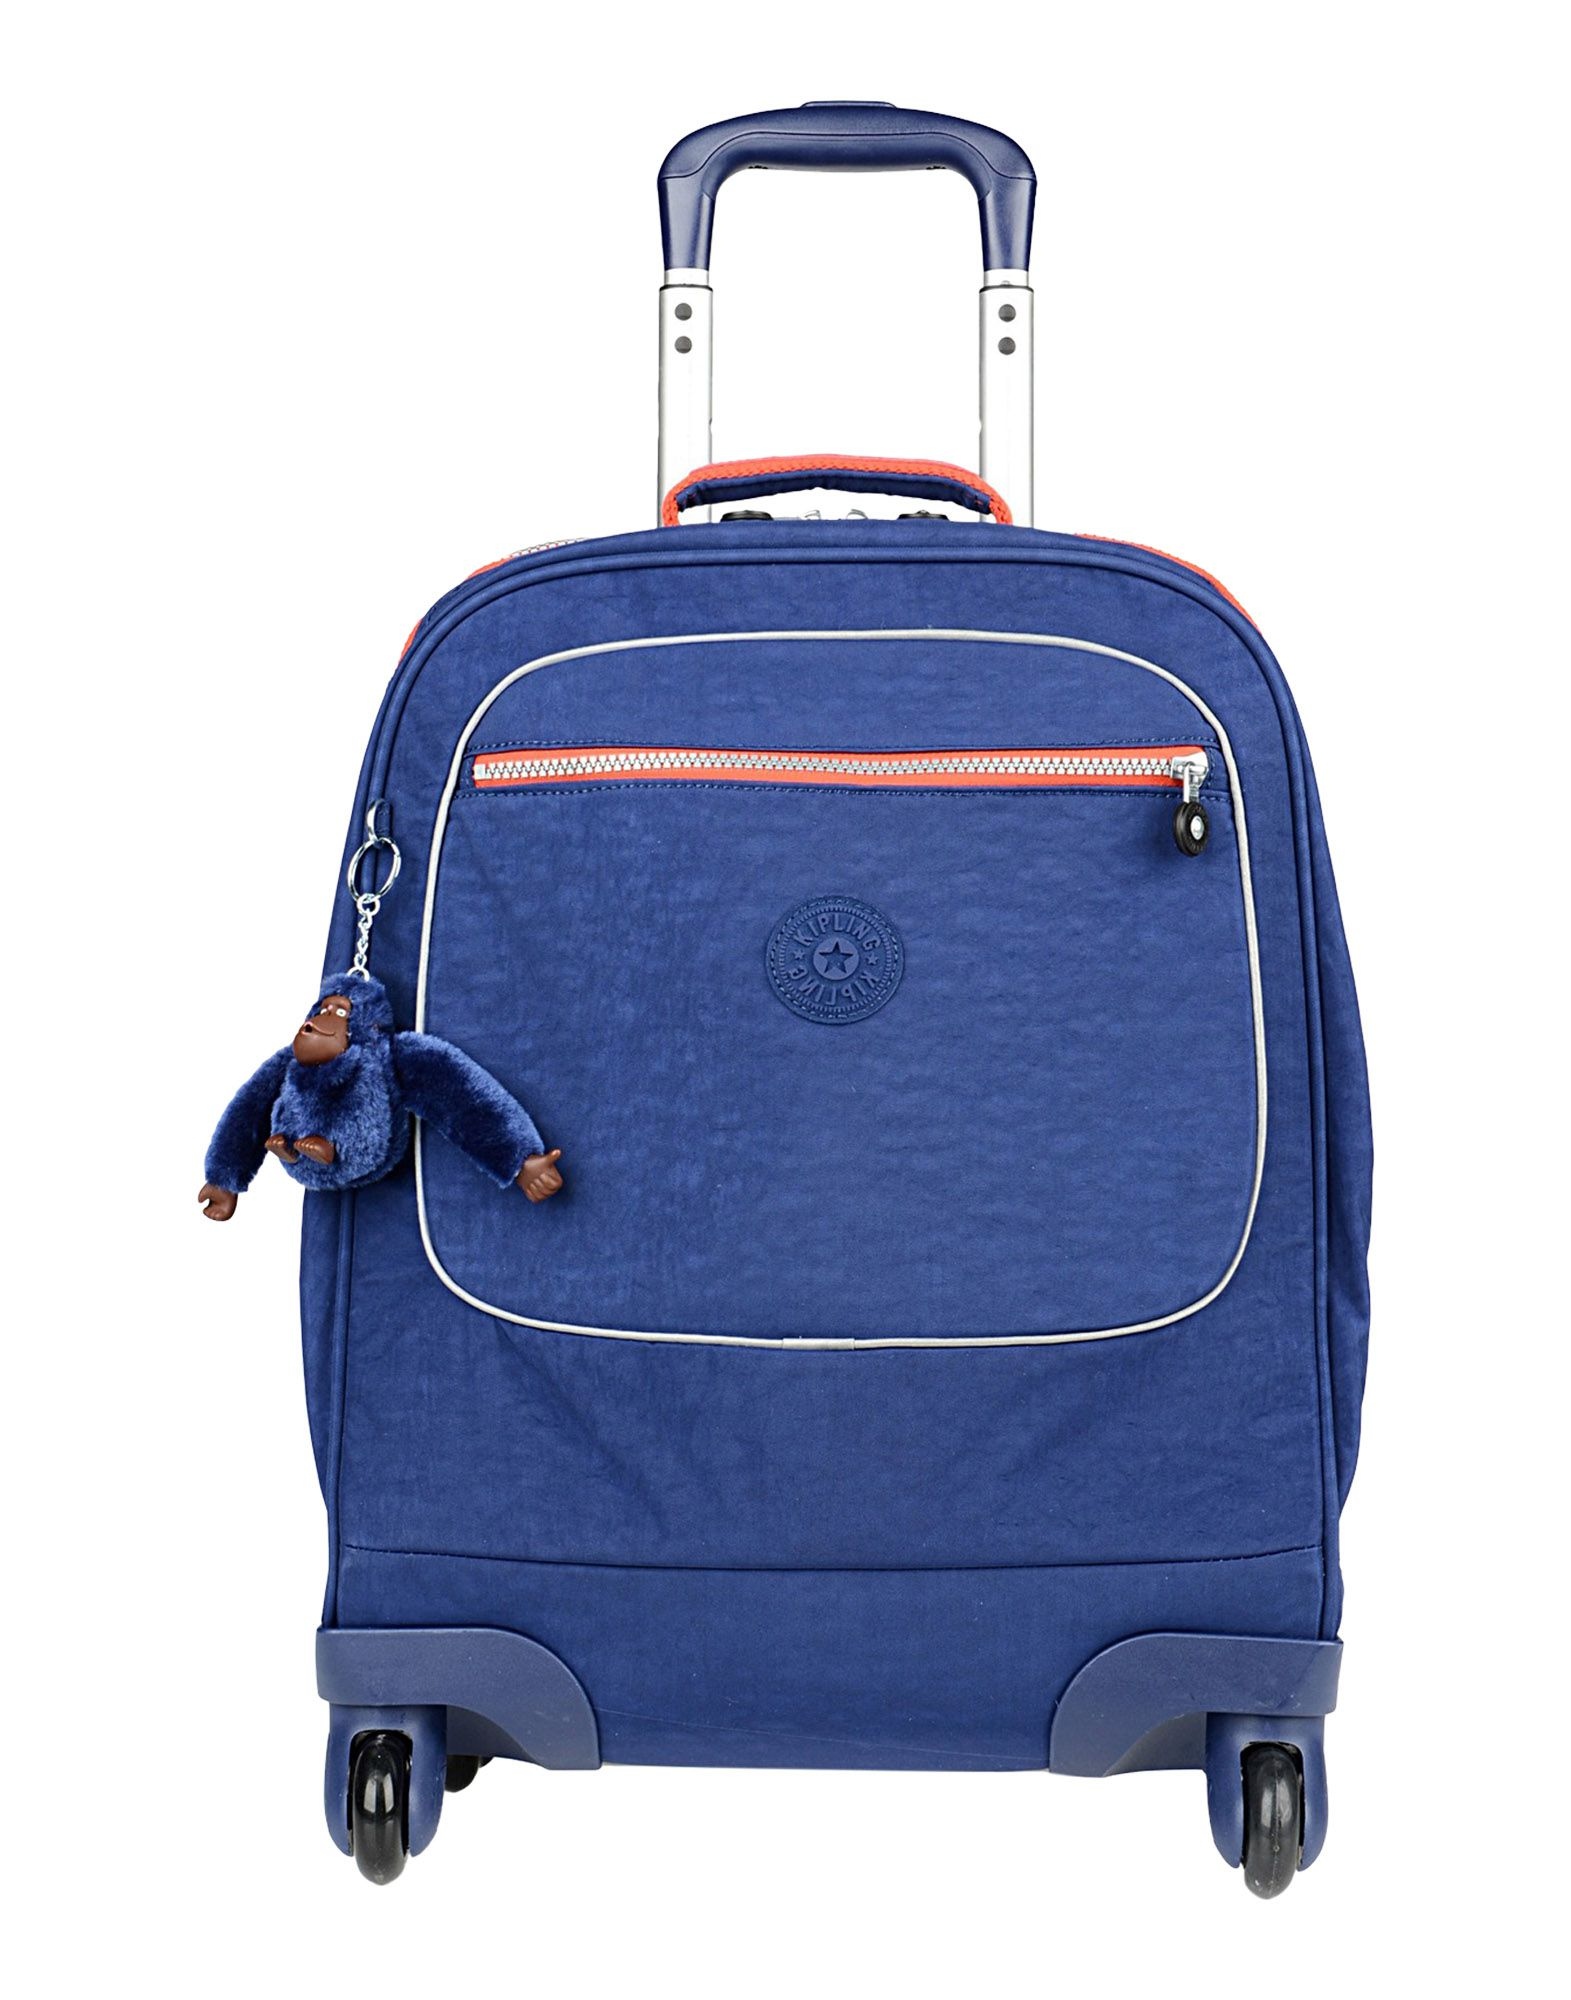 KIPLING Чемодан/сумка на колесиках сумка kipling 2015 k12969